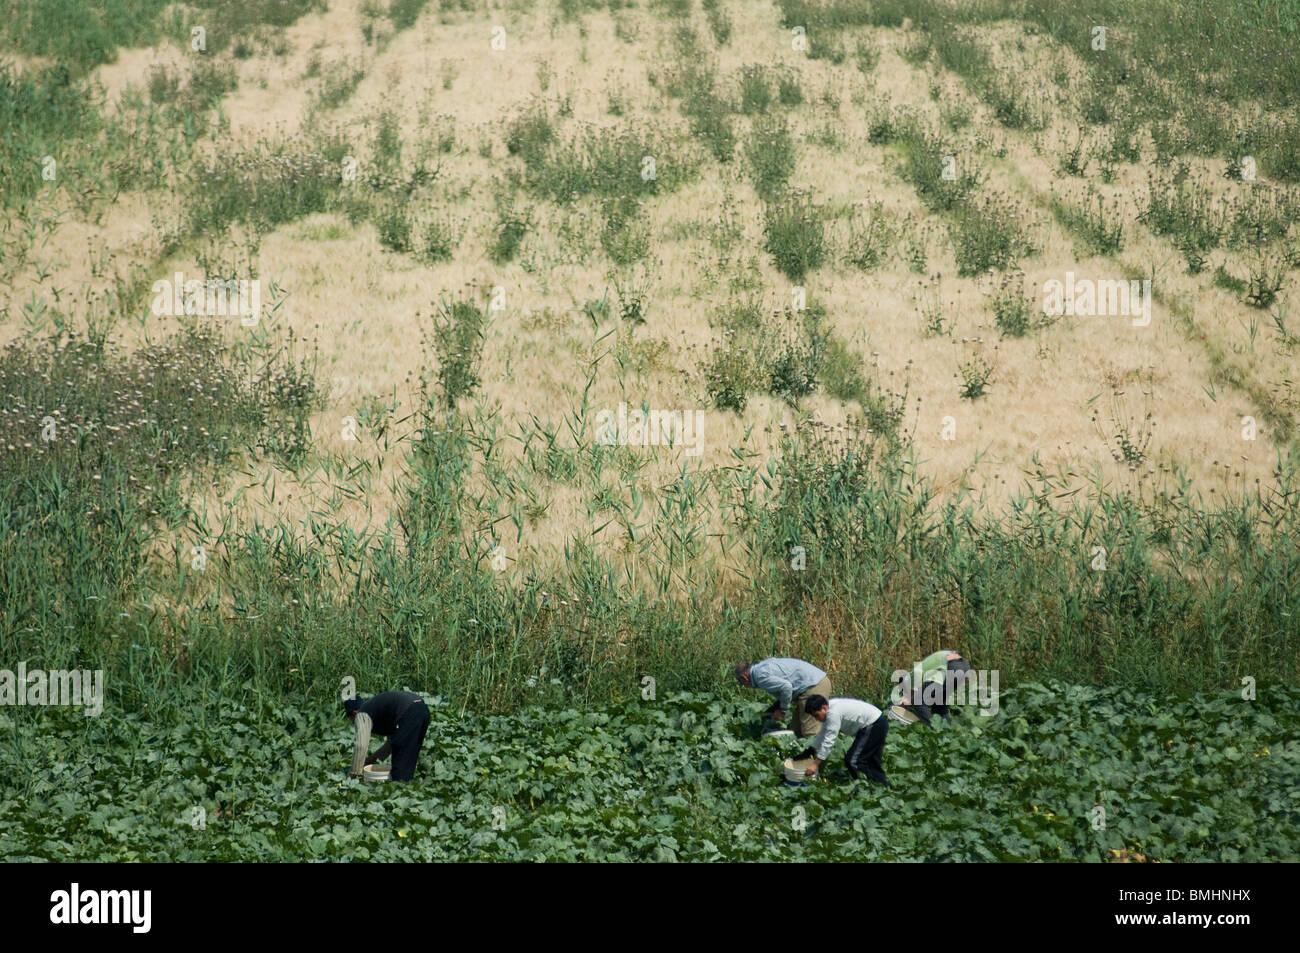 Jordanian farm workers harvesting in a field Jordan valley - Stock Image